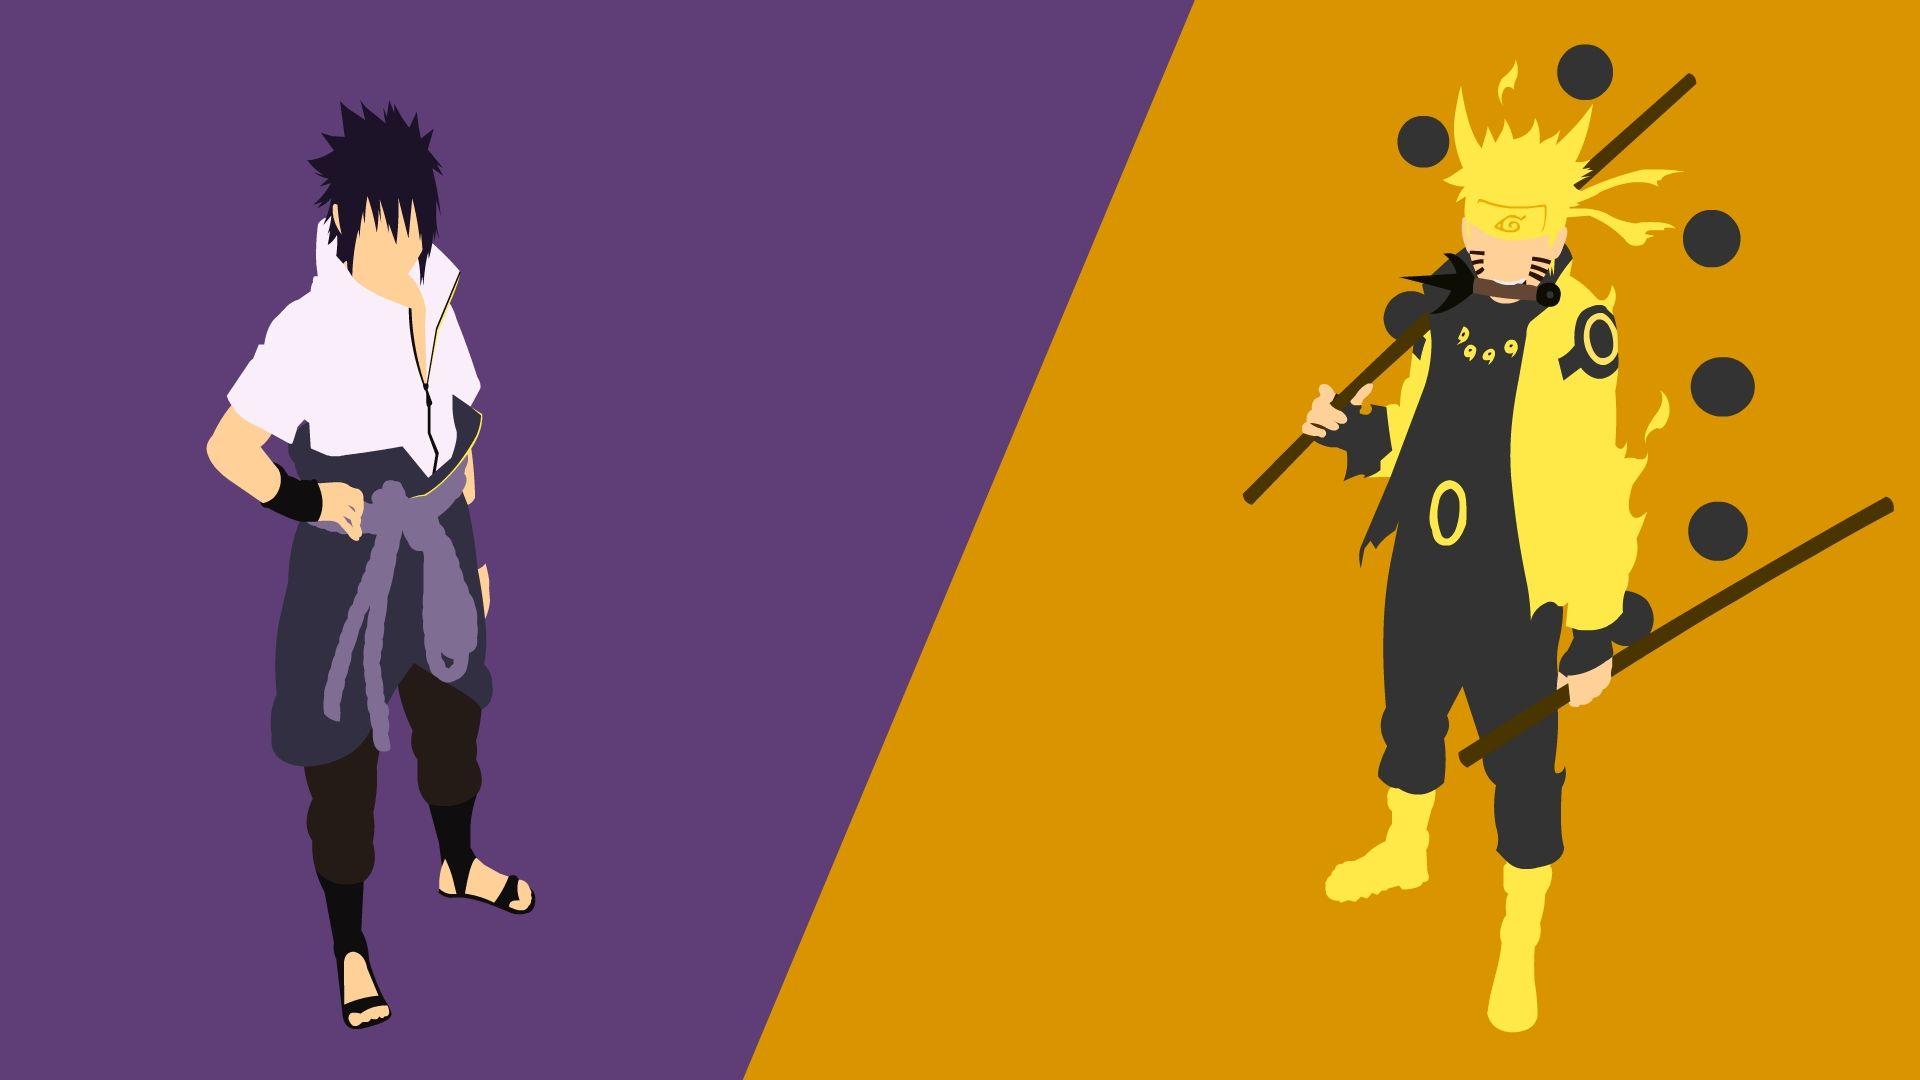 Top Wallpaper Naruto Art - bf2a4296d809ad69c54c06b59affd9e0  Collection_21821.jpg